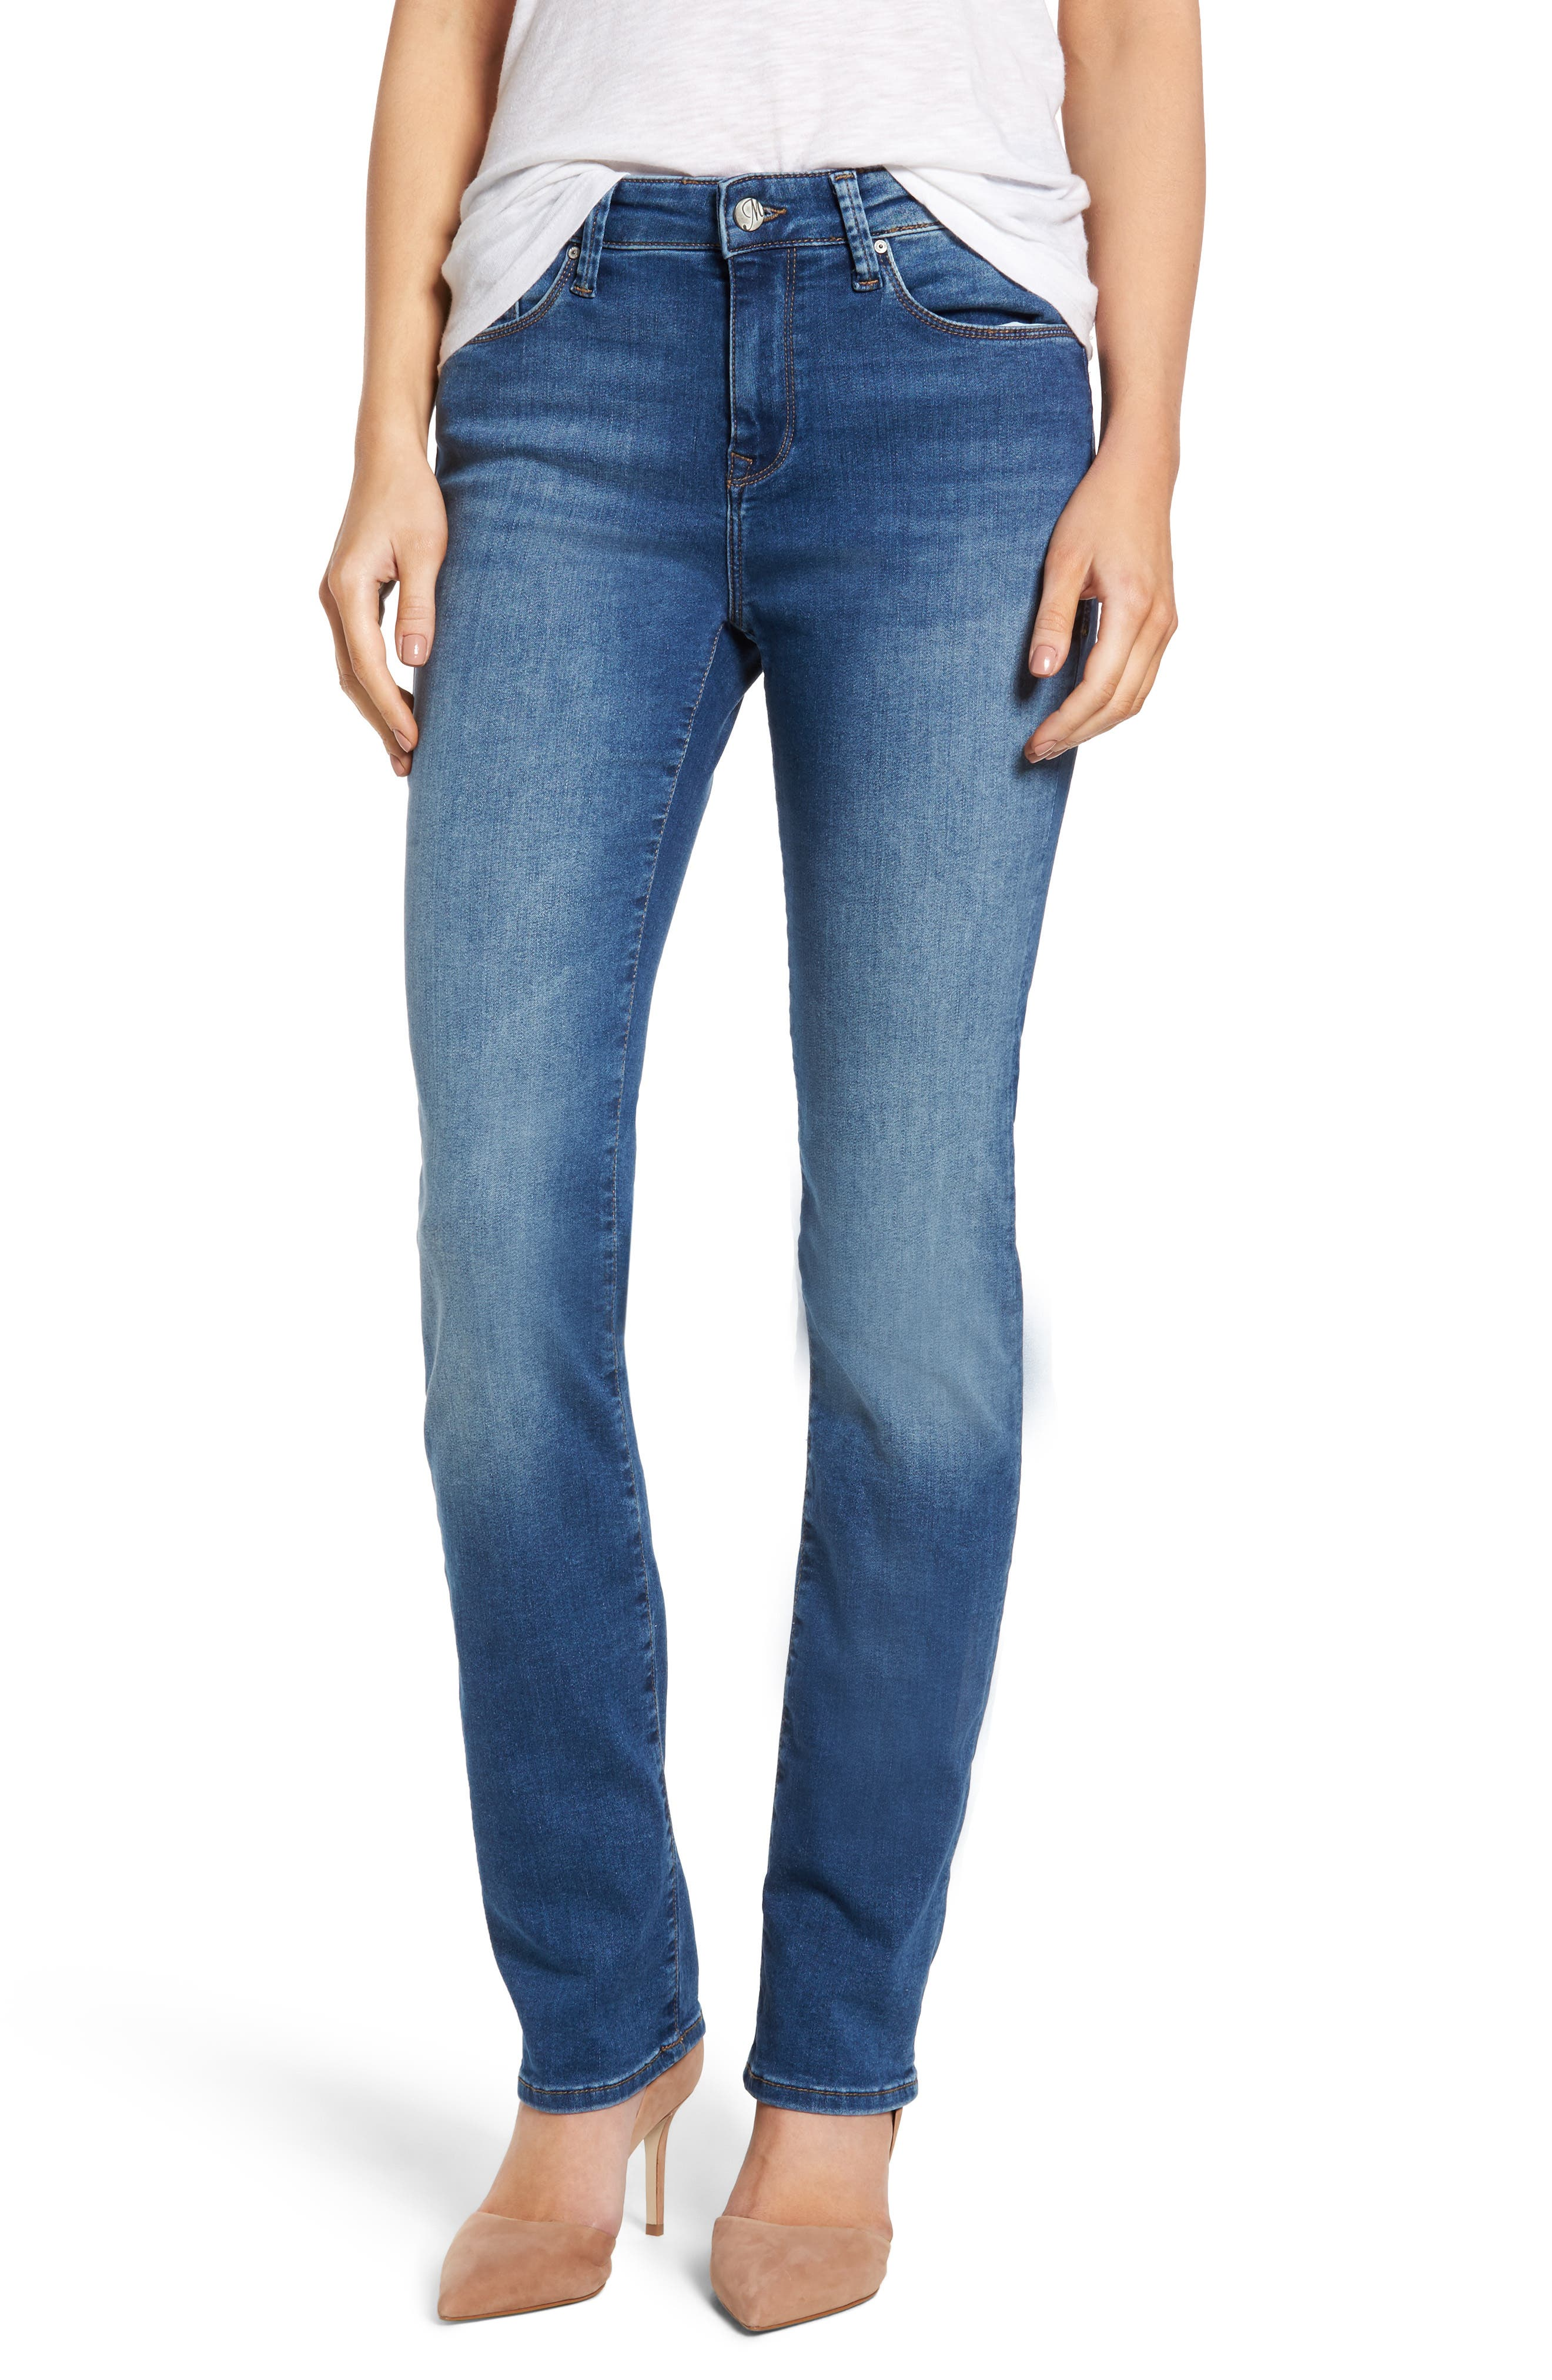 Kendra High Waist Stretch Denim Jeans,                         Main,                         color, 650